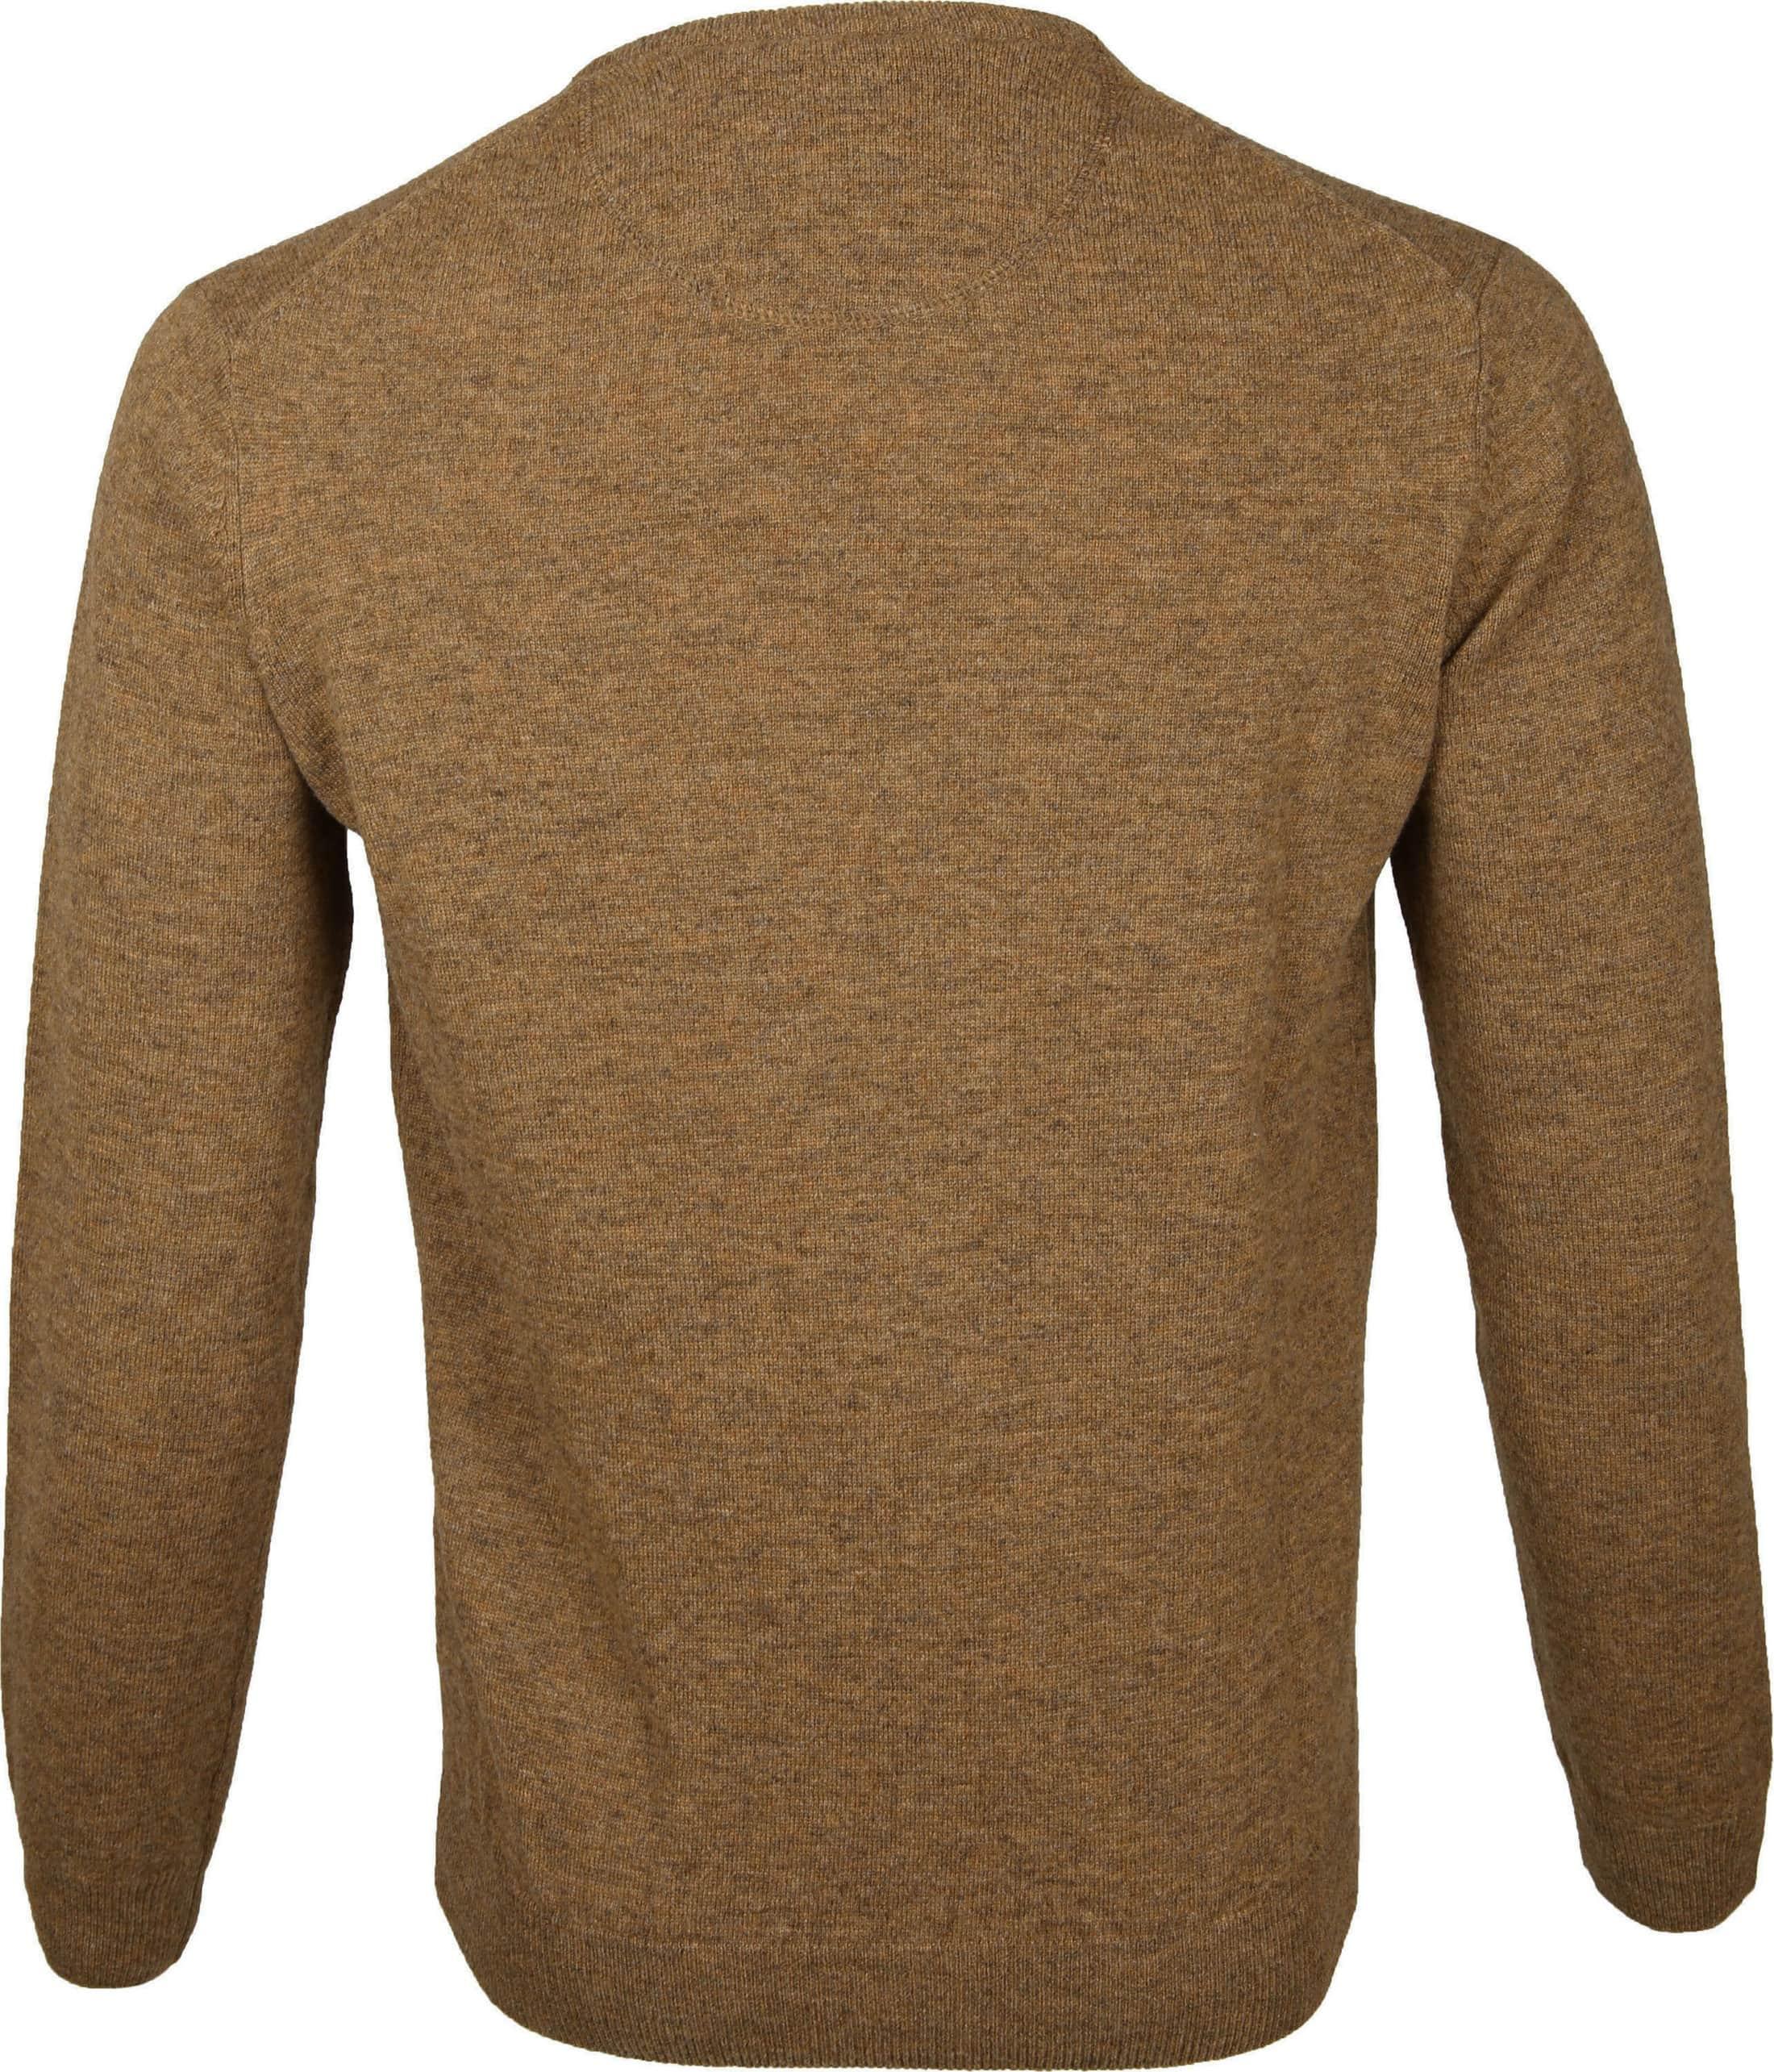 Suitable Pullover Lammwolle V-Ausschnitt Kamel foto 2